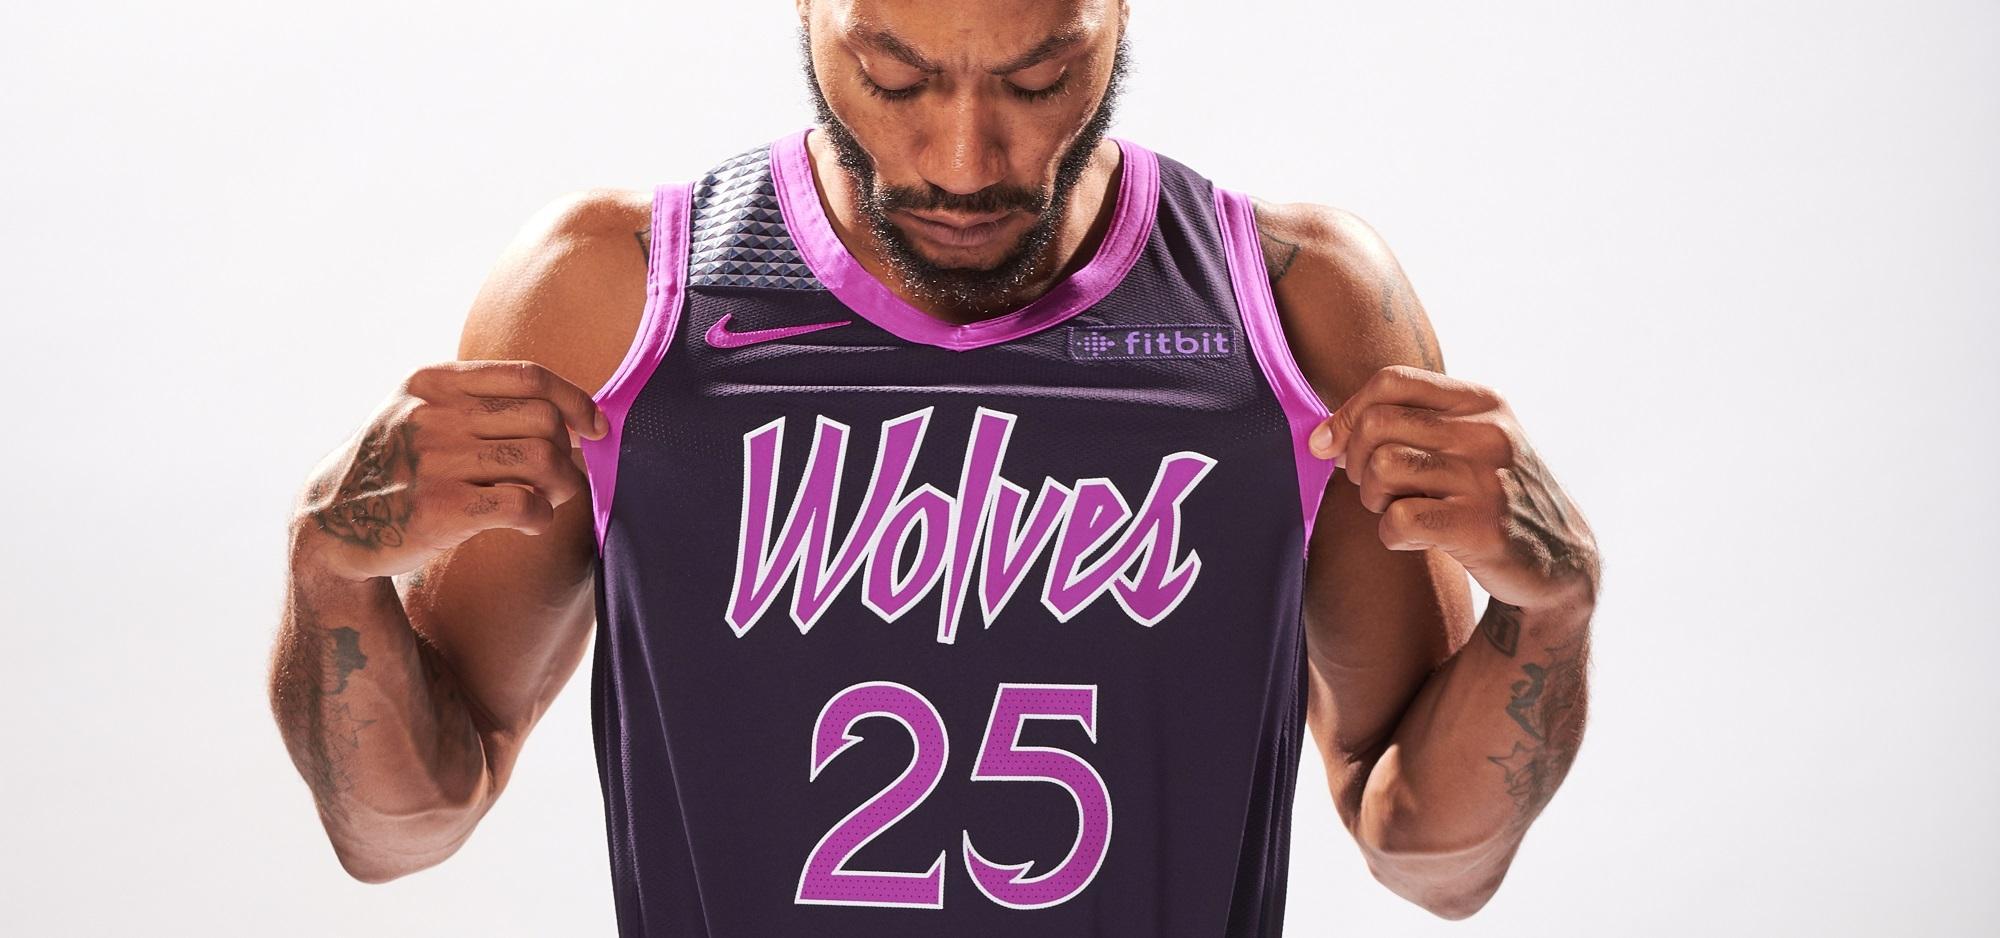 newest 4aa59 dc4e6 Derrick Rose White Swingman Jersey - Minnesota Timber-wolves #25 Earned  Edition